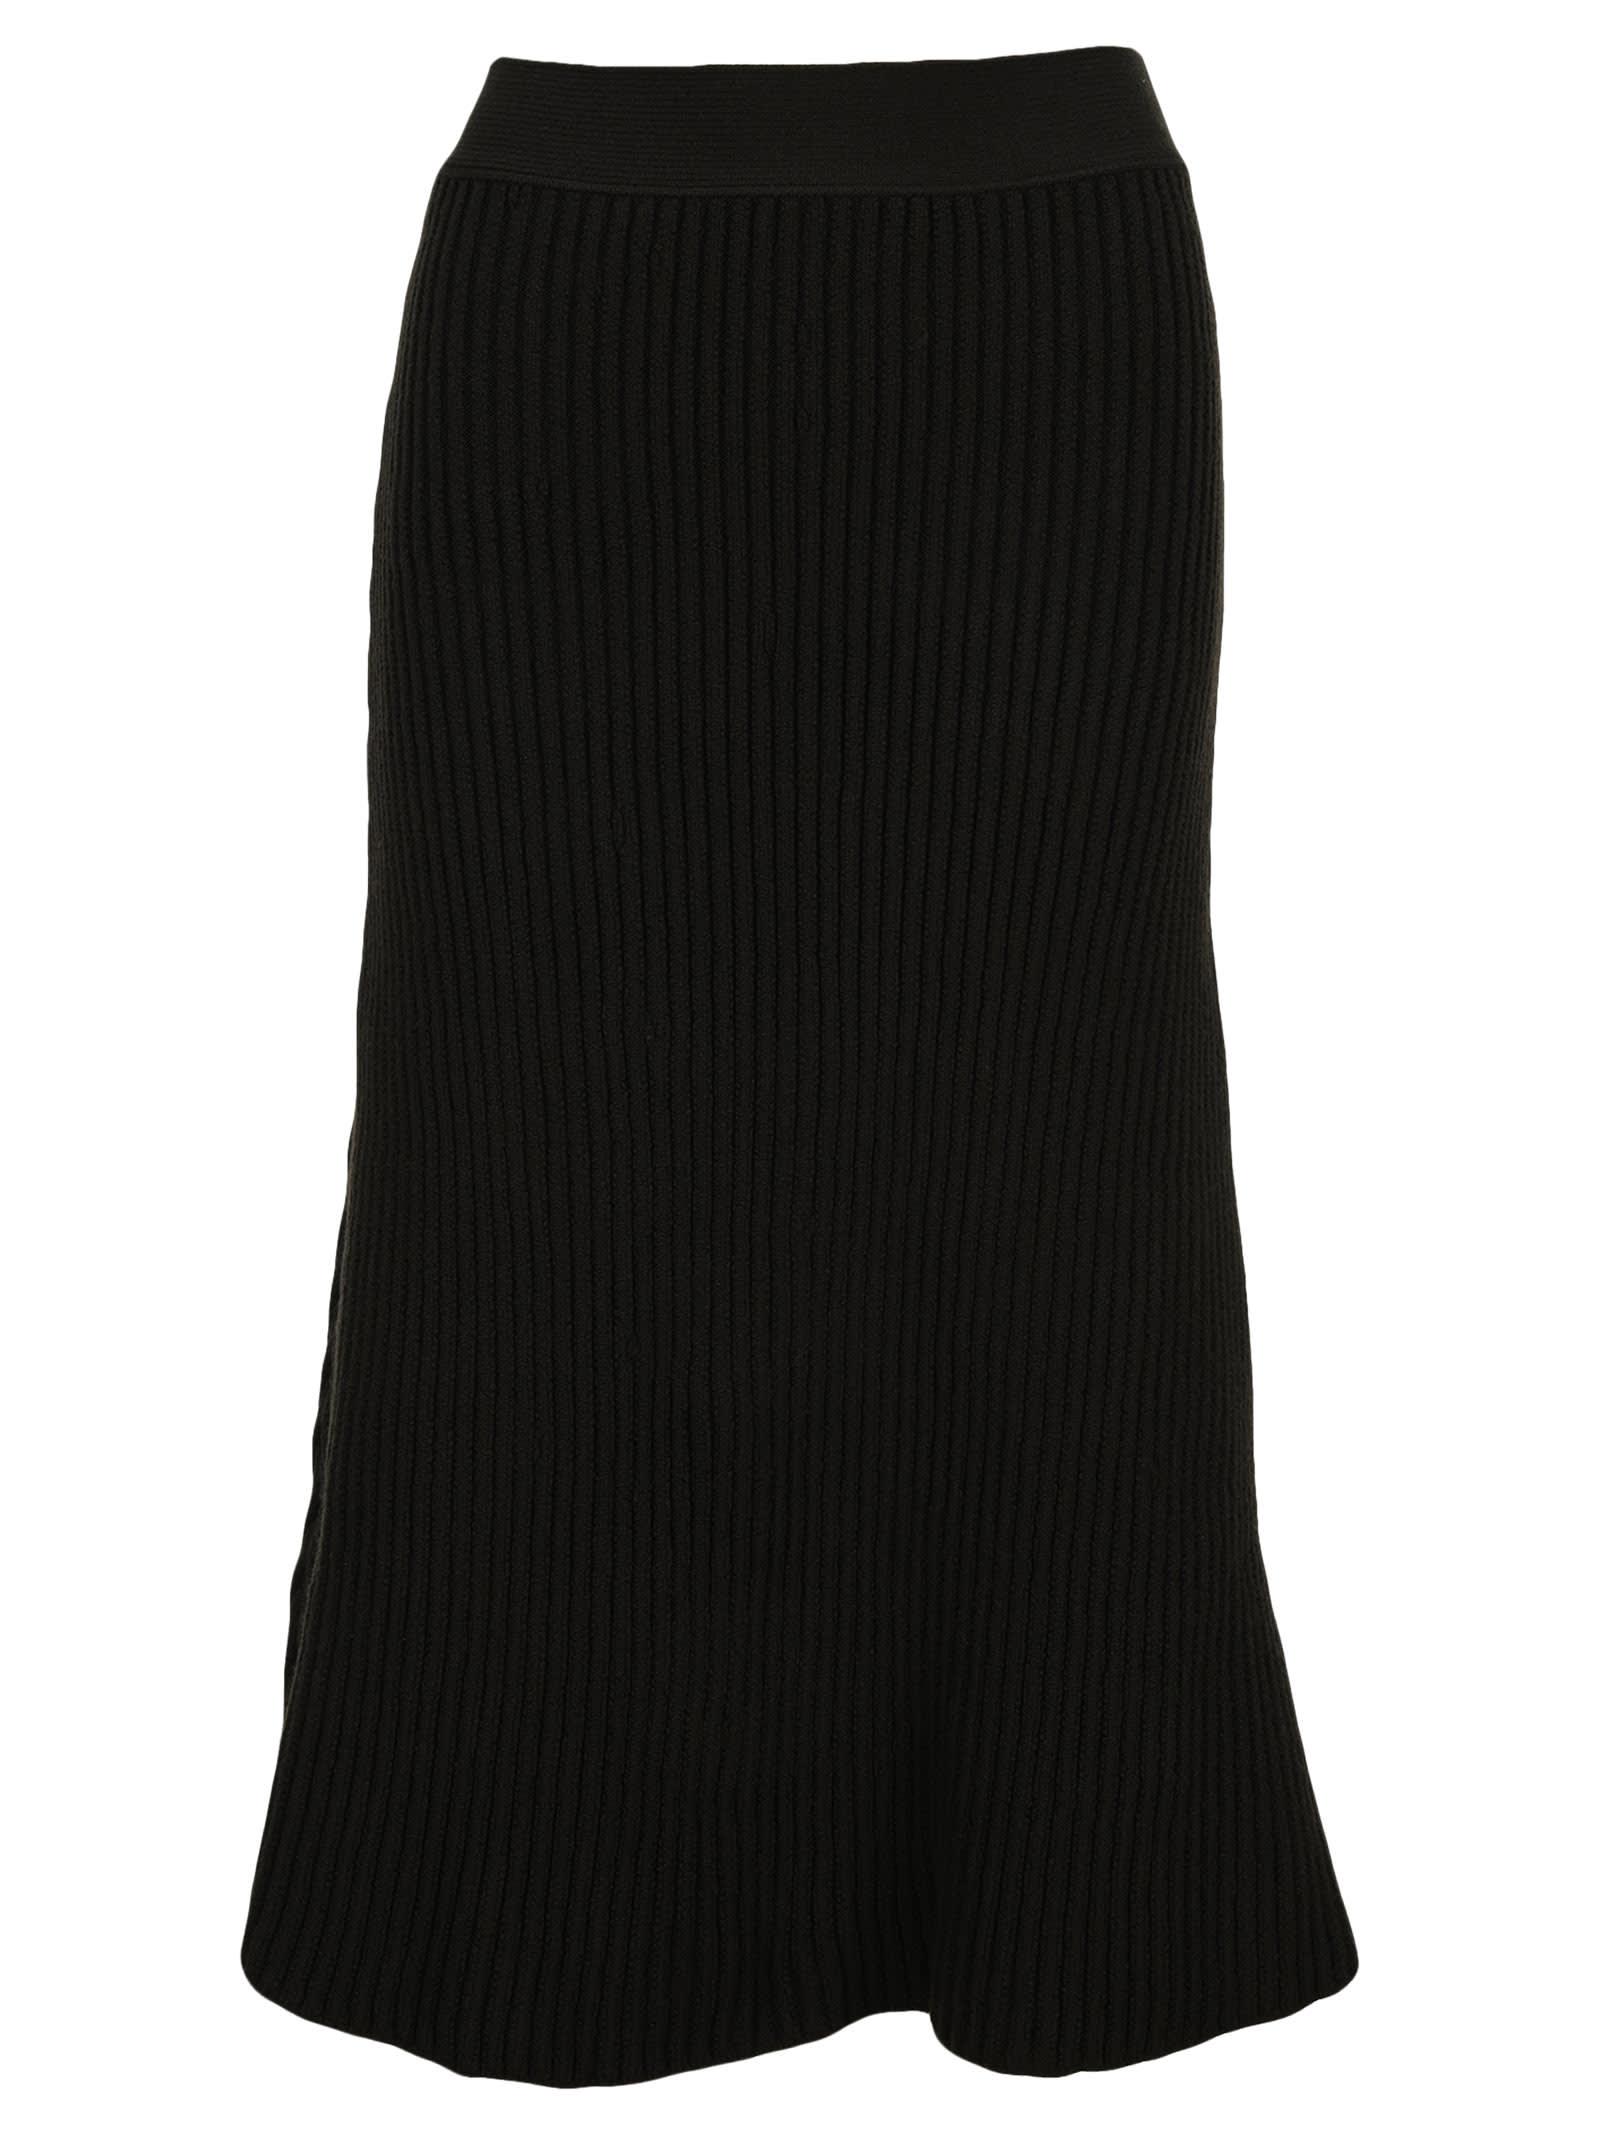 Bottega Veneta Ribbed Knit Midi Skirt